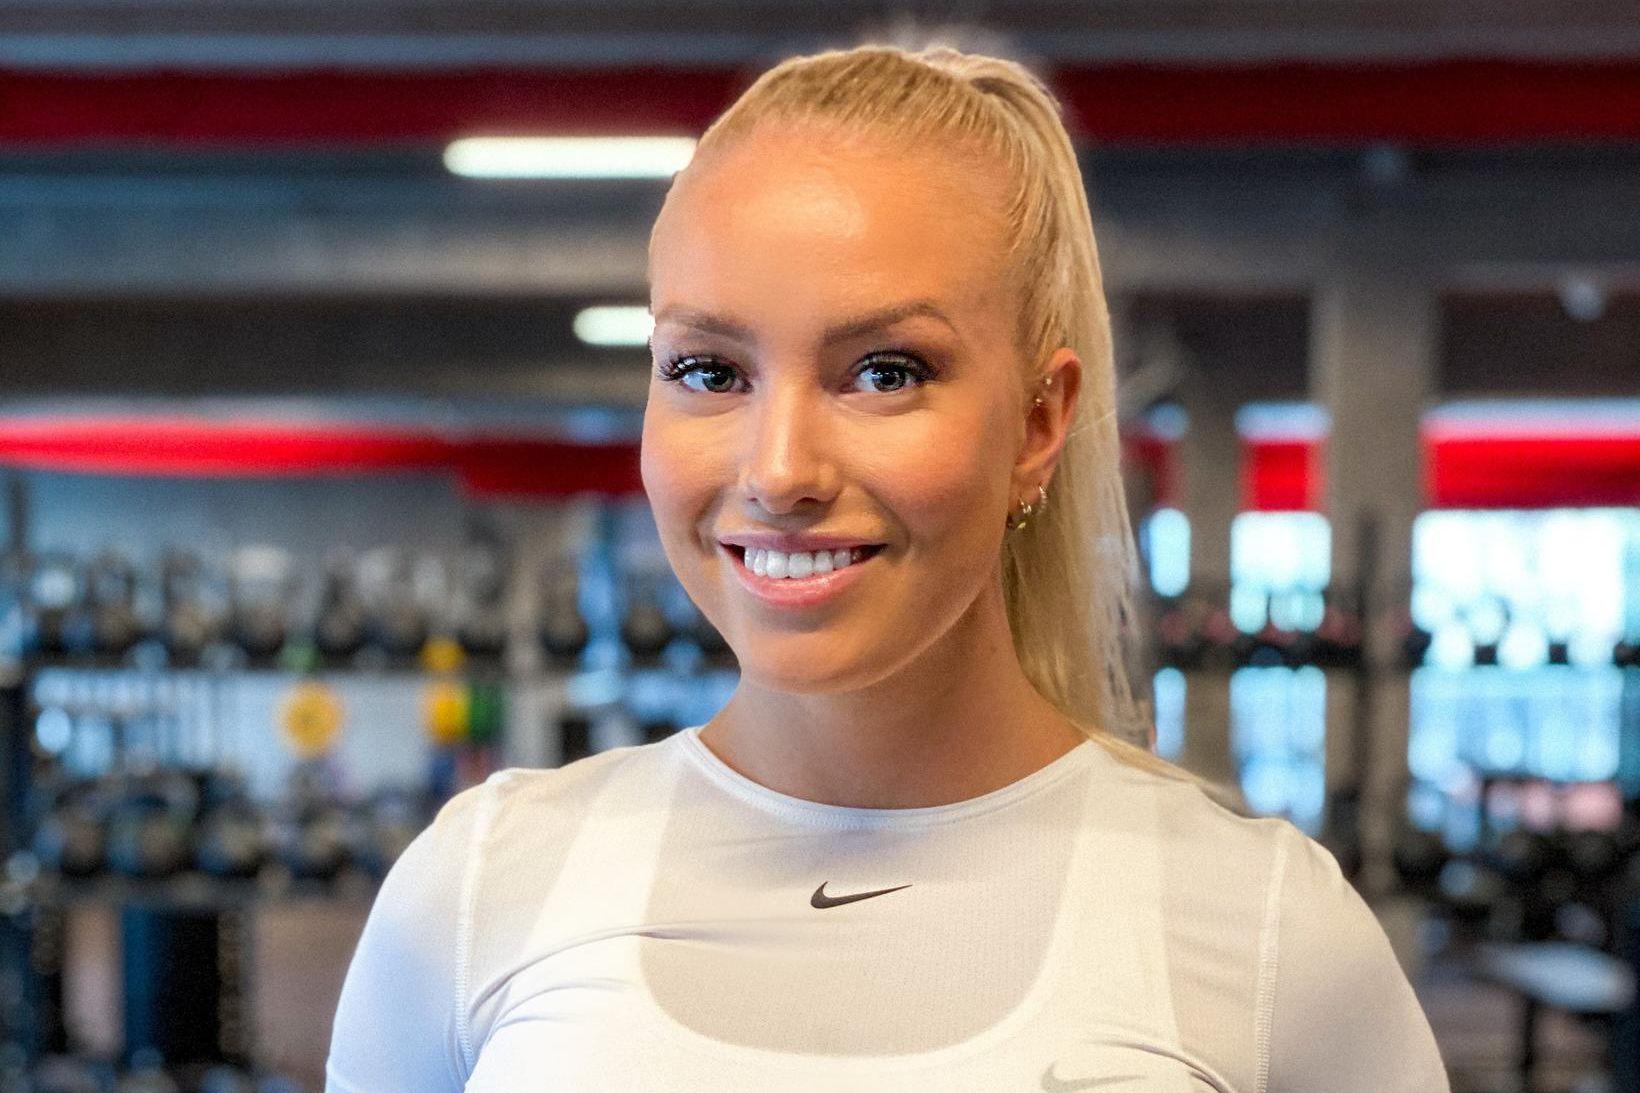 Birgitta Líf Björnsdóttir starfar hjá World Class.